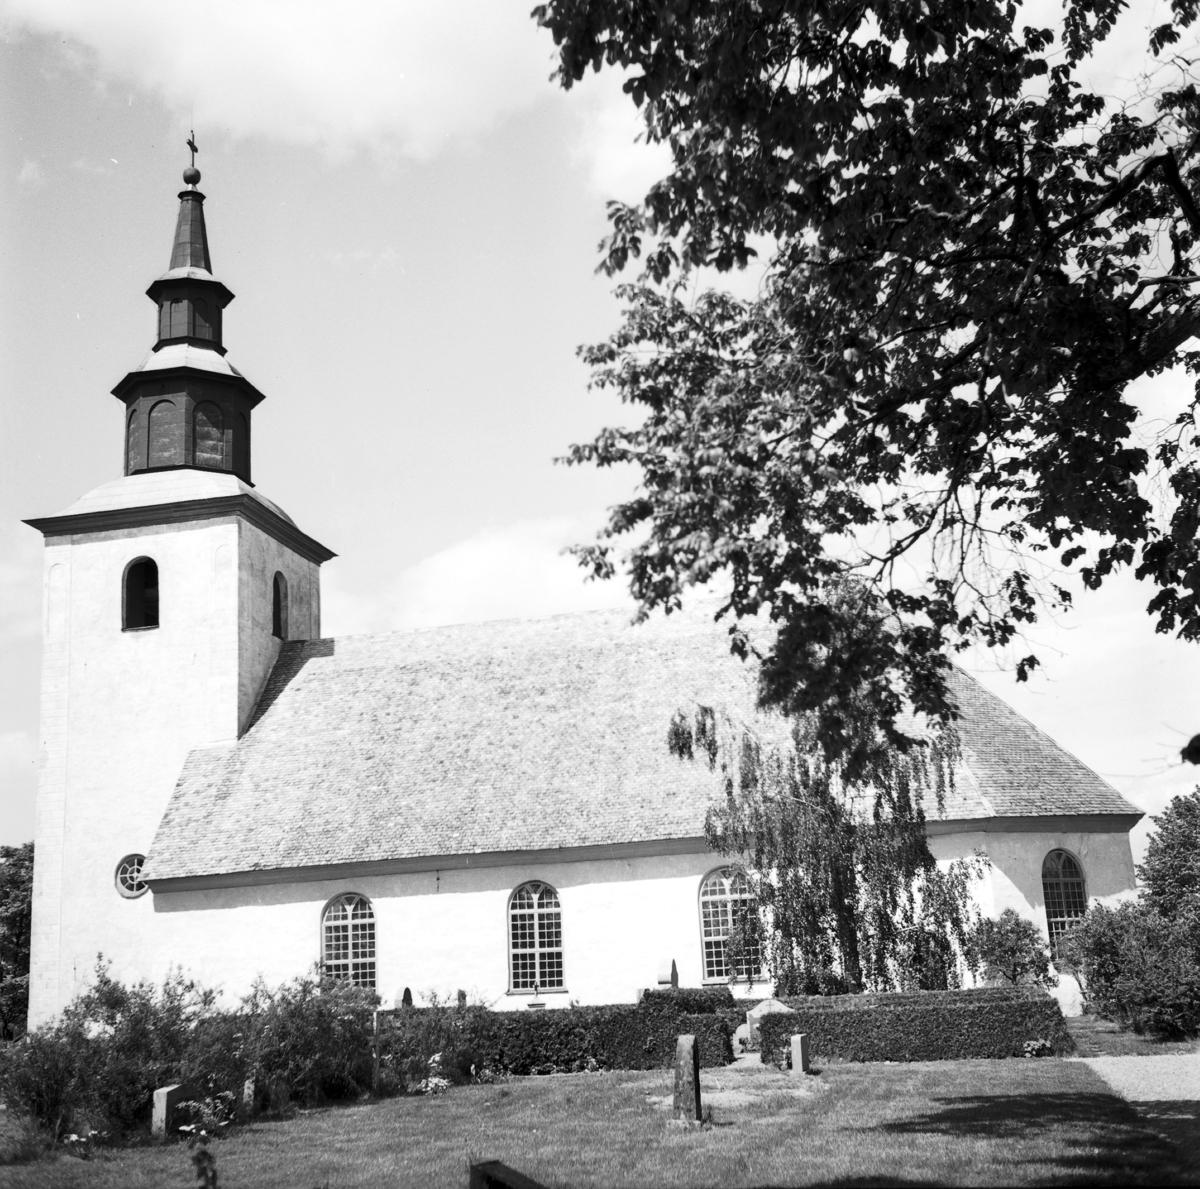 Segerstads kyrka, Vrmland - Wikiwand